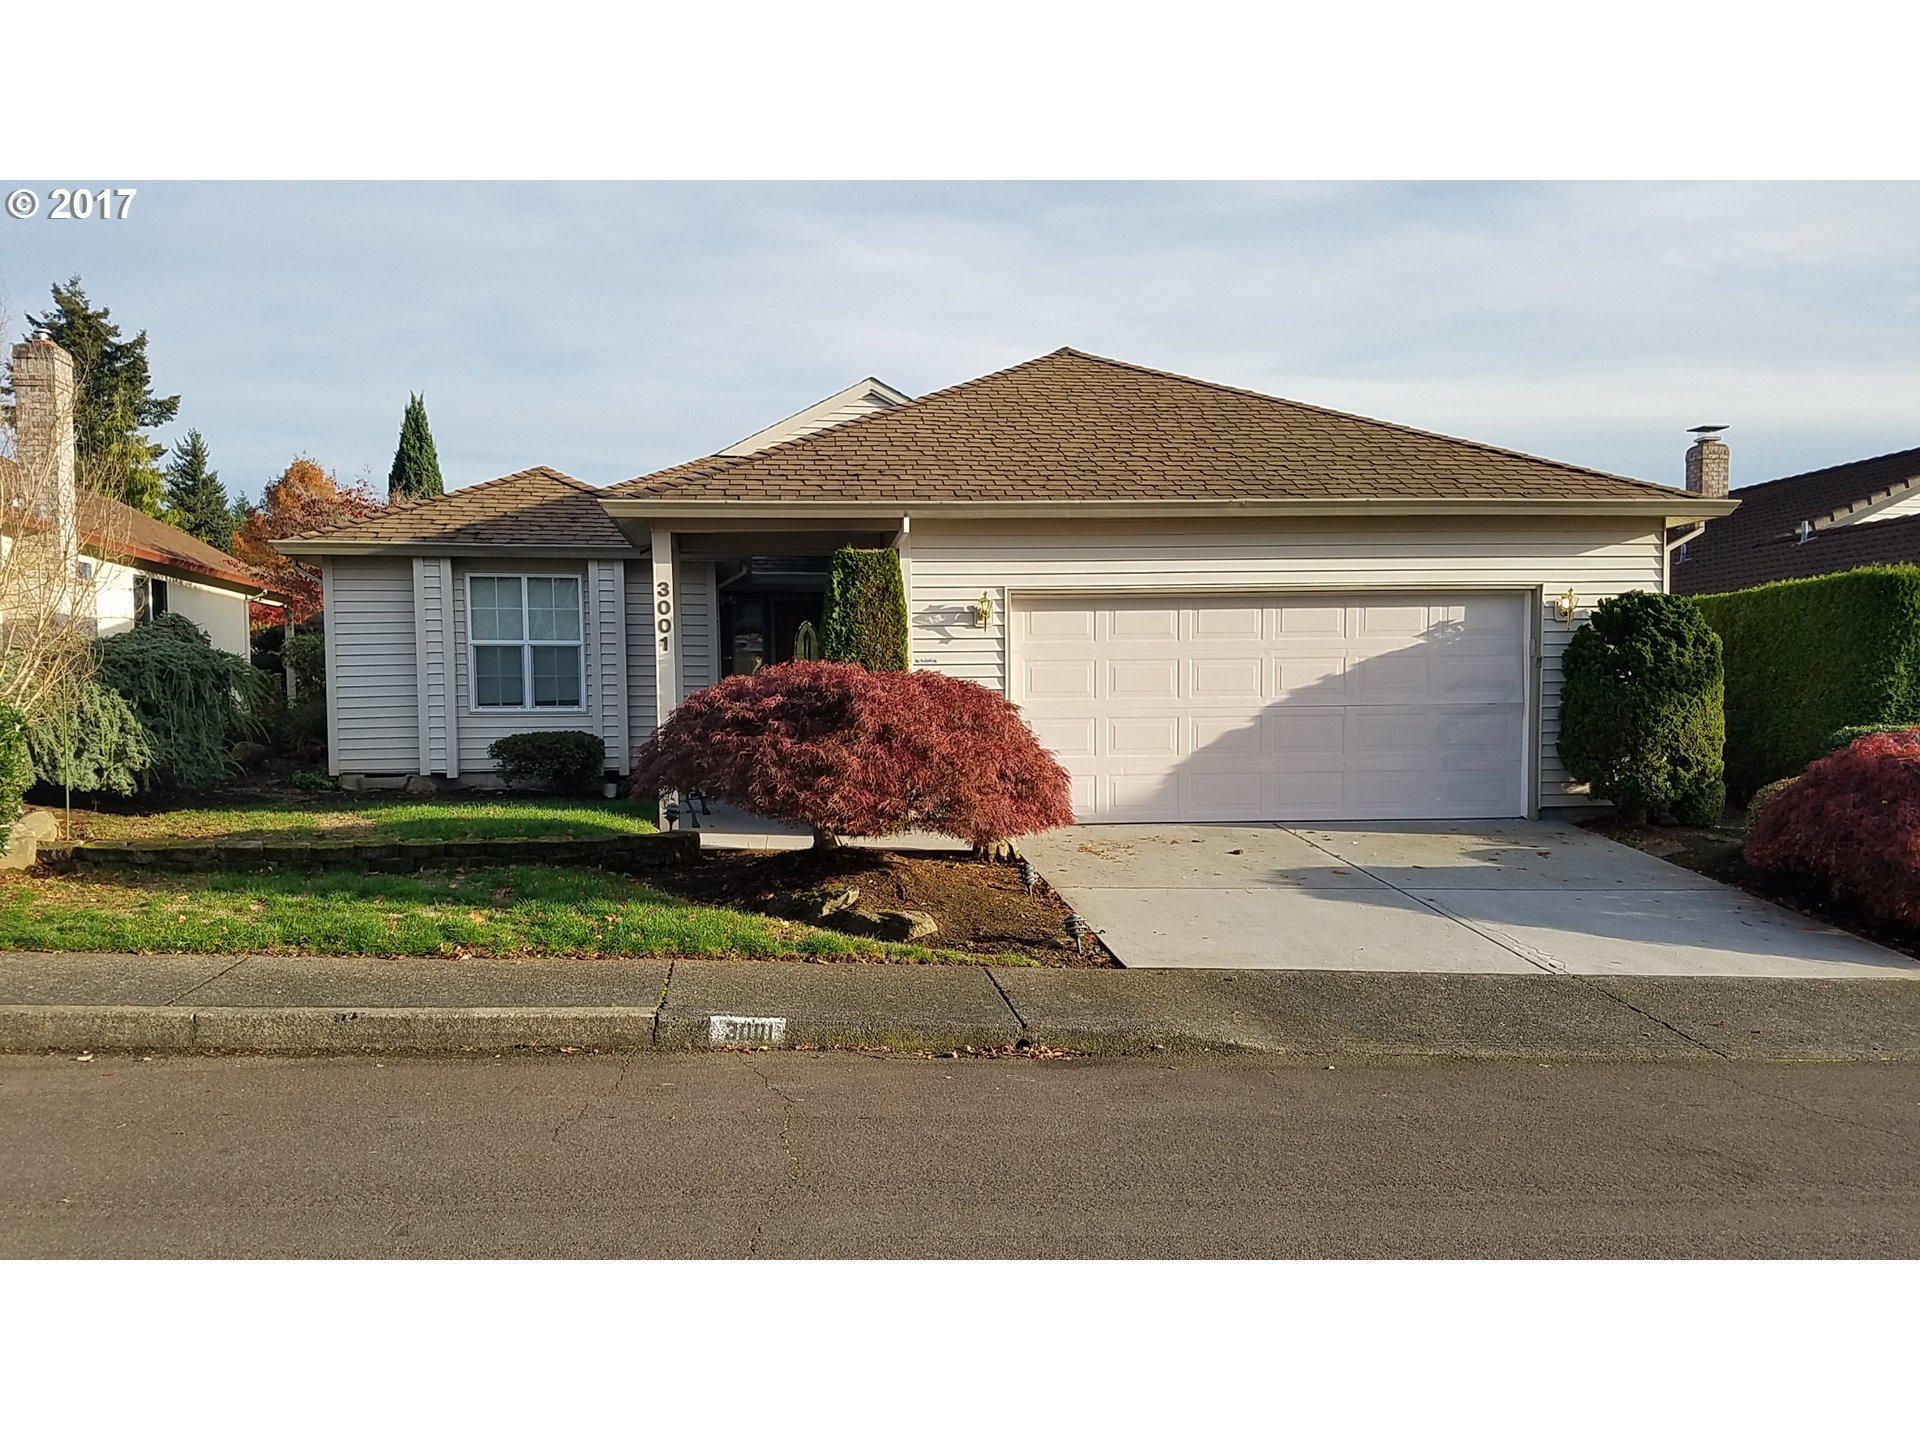 3001 SE 154TH AVE, Vancouver, WA 98683